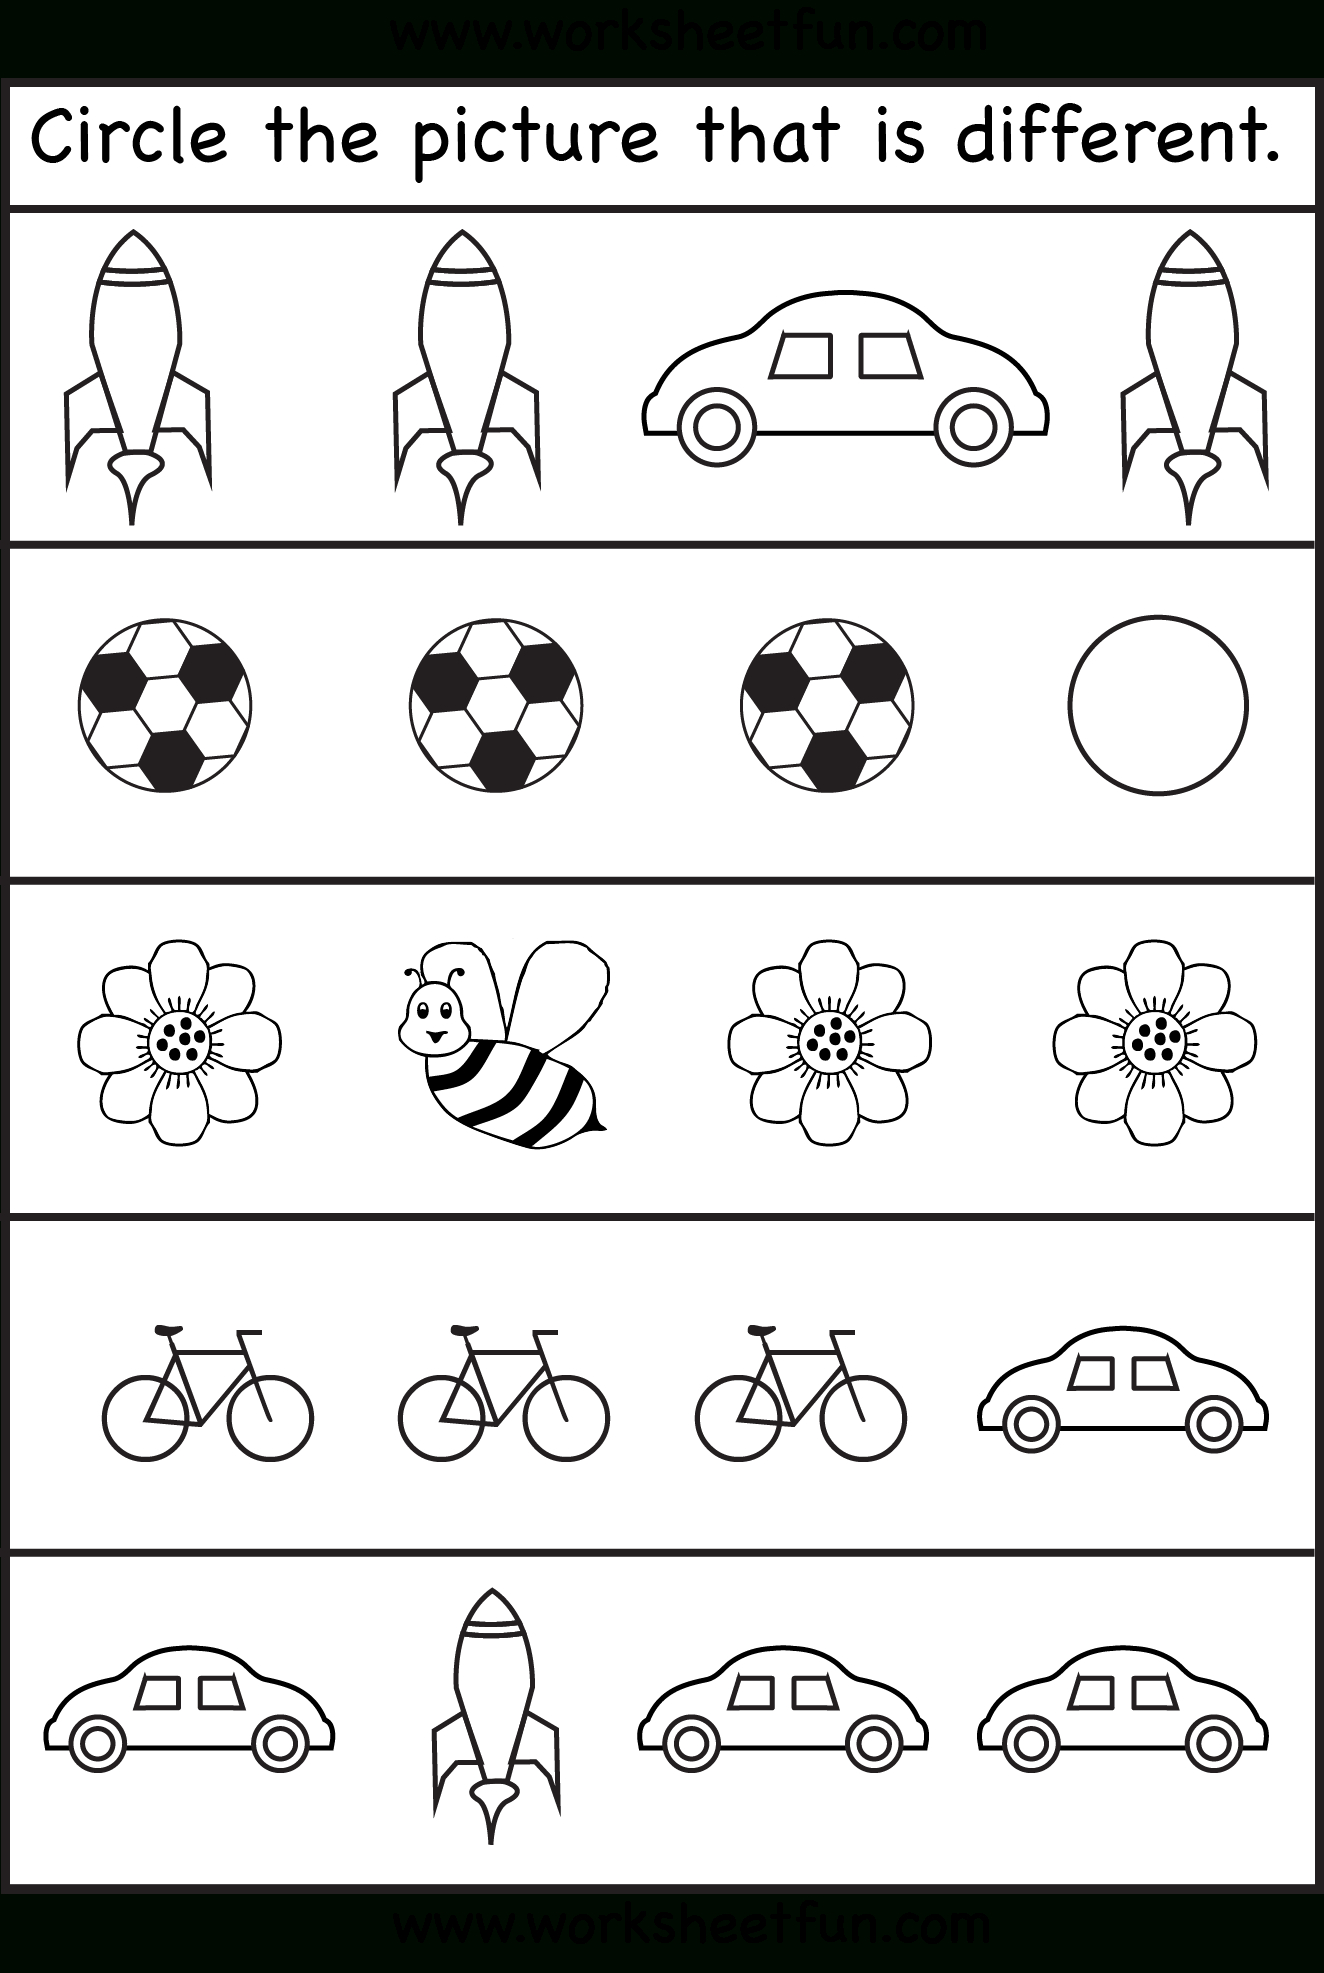 Free Alphabet Abc Printable Packs